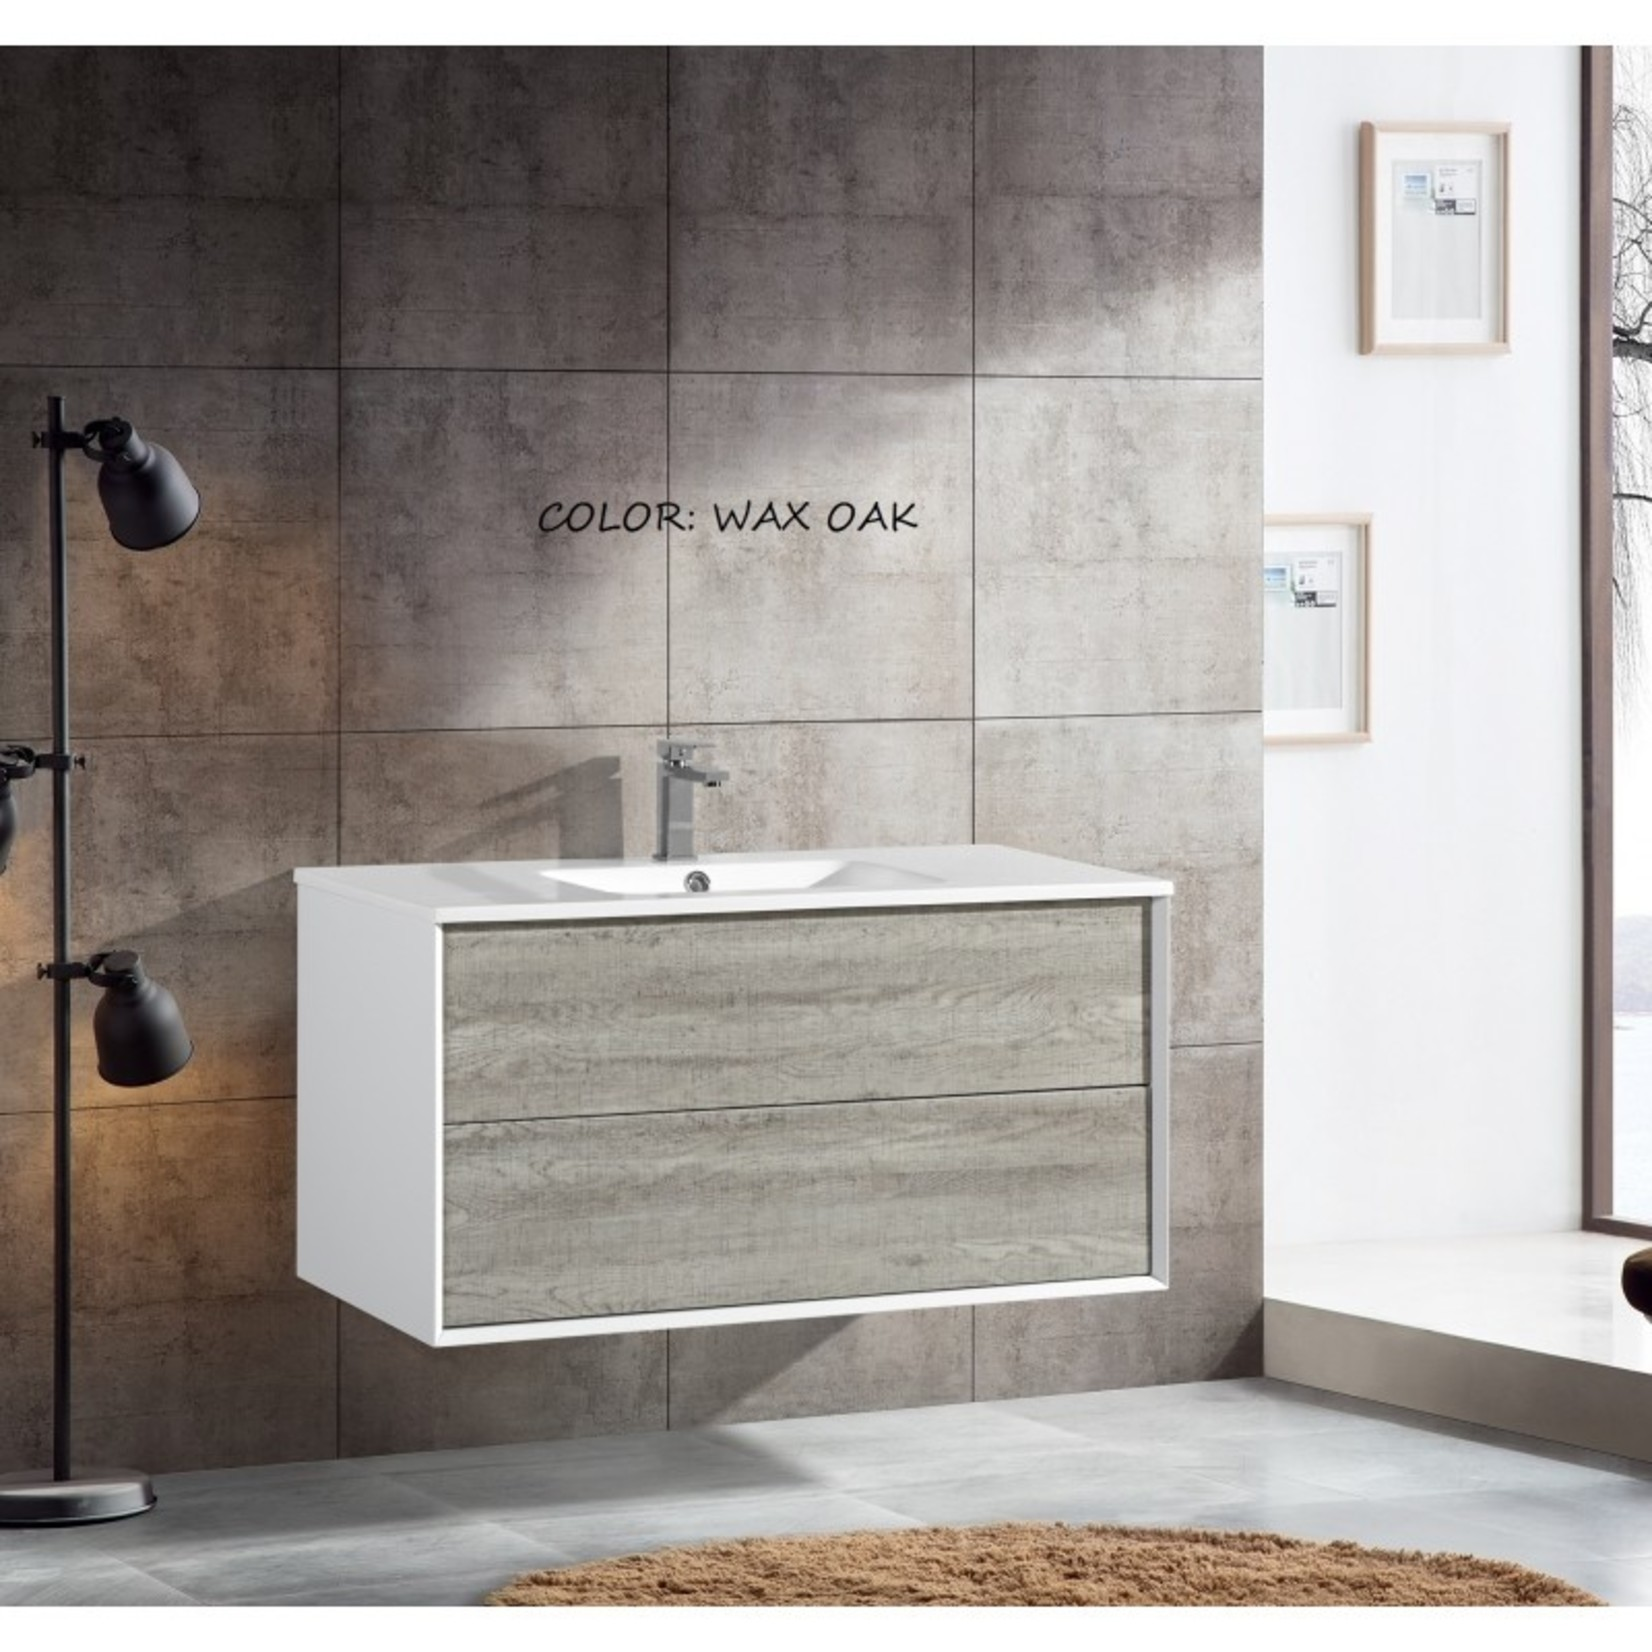 "40 ""vanity 165100 Wax Oak"